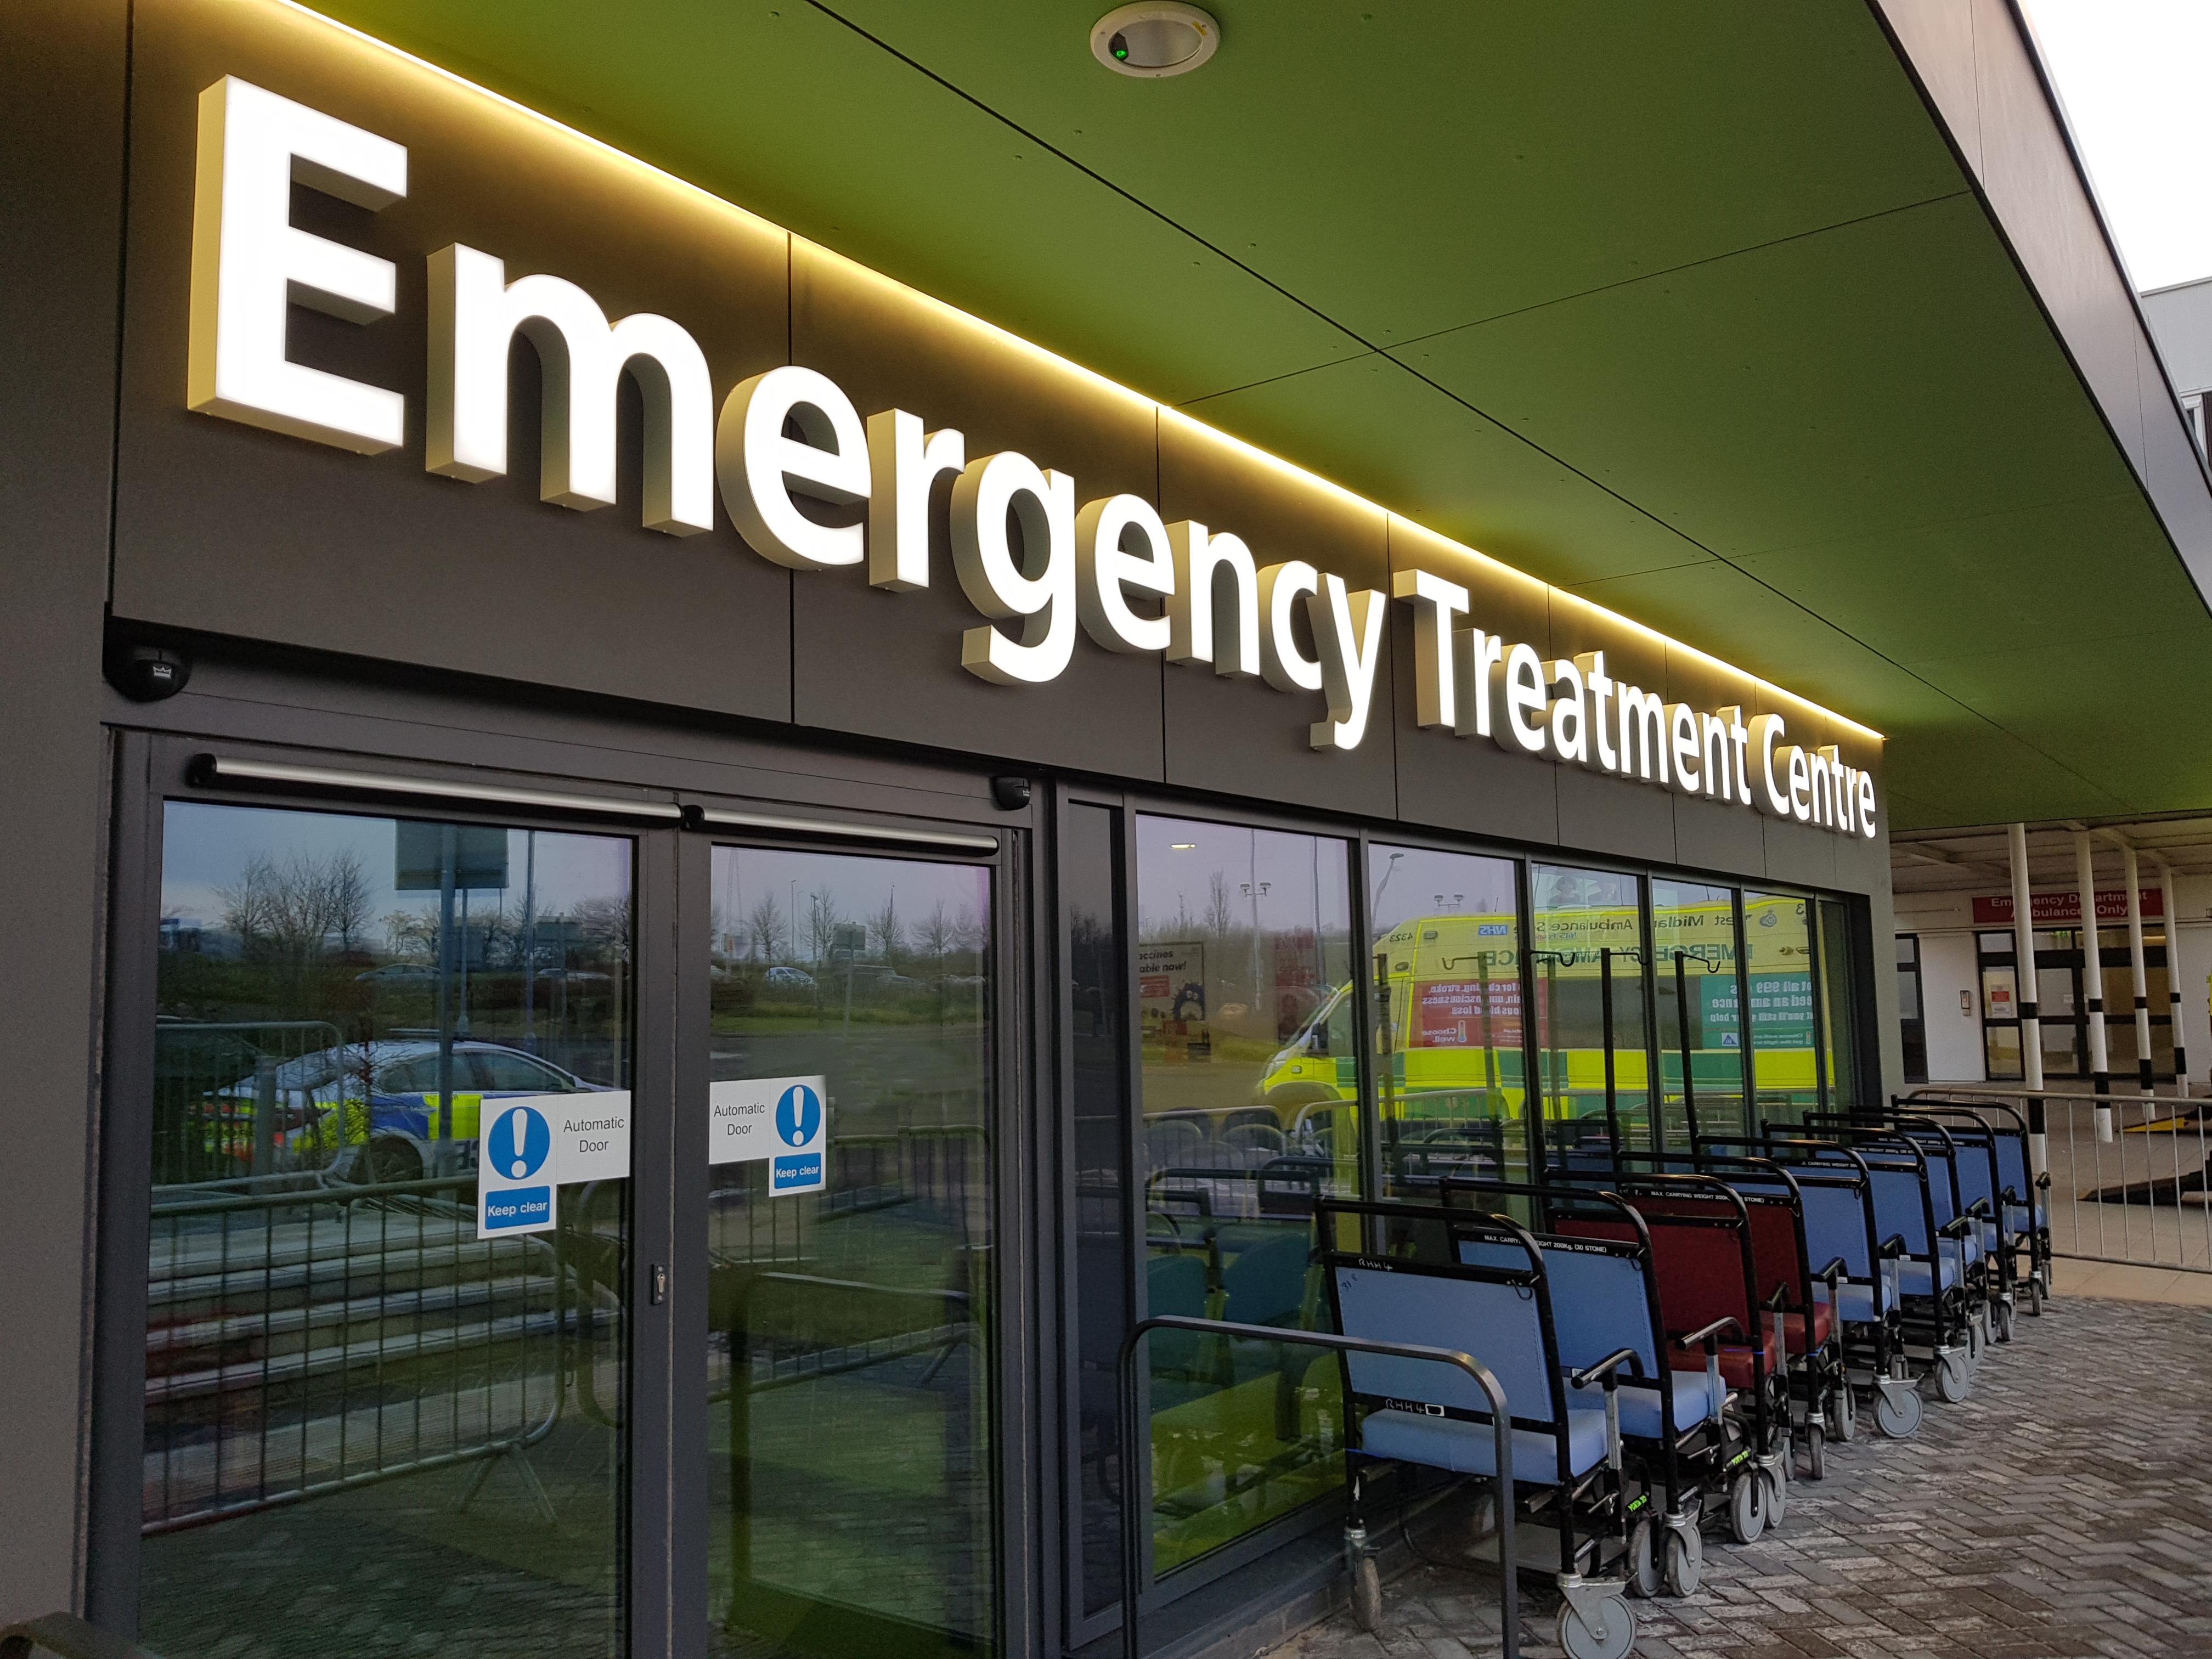 Russells Hall Hospital Emergency Department set to receive £20 million refurbishment